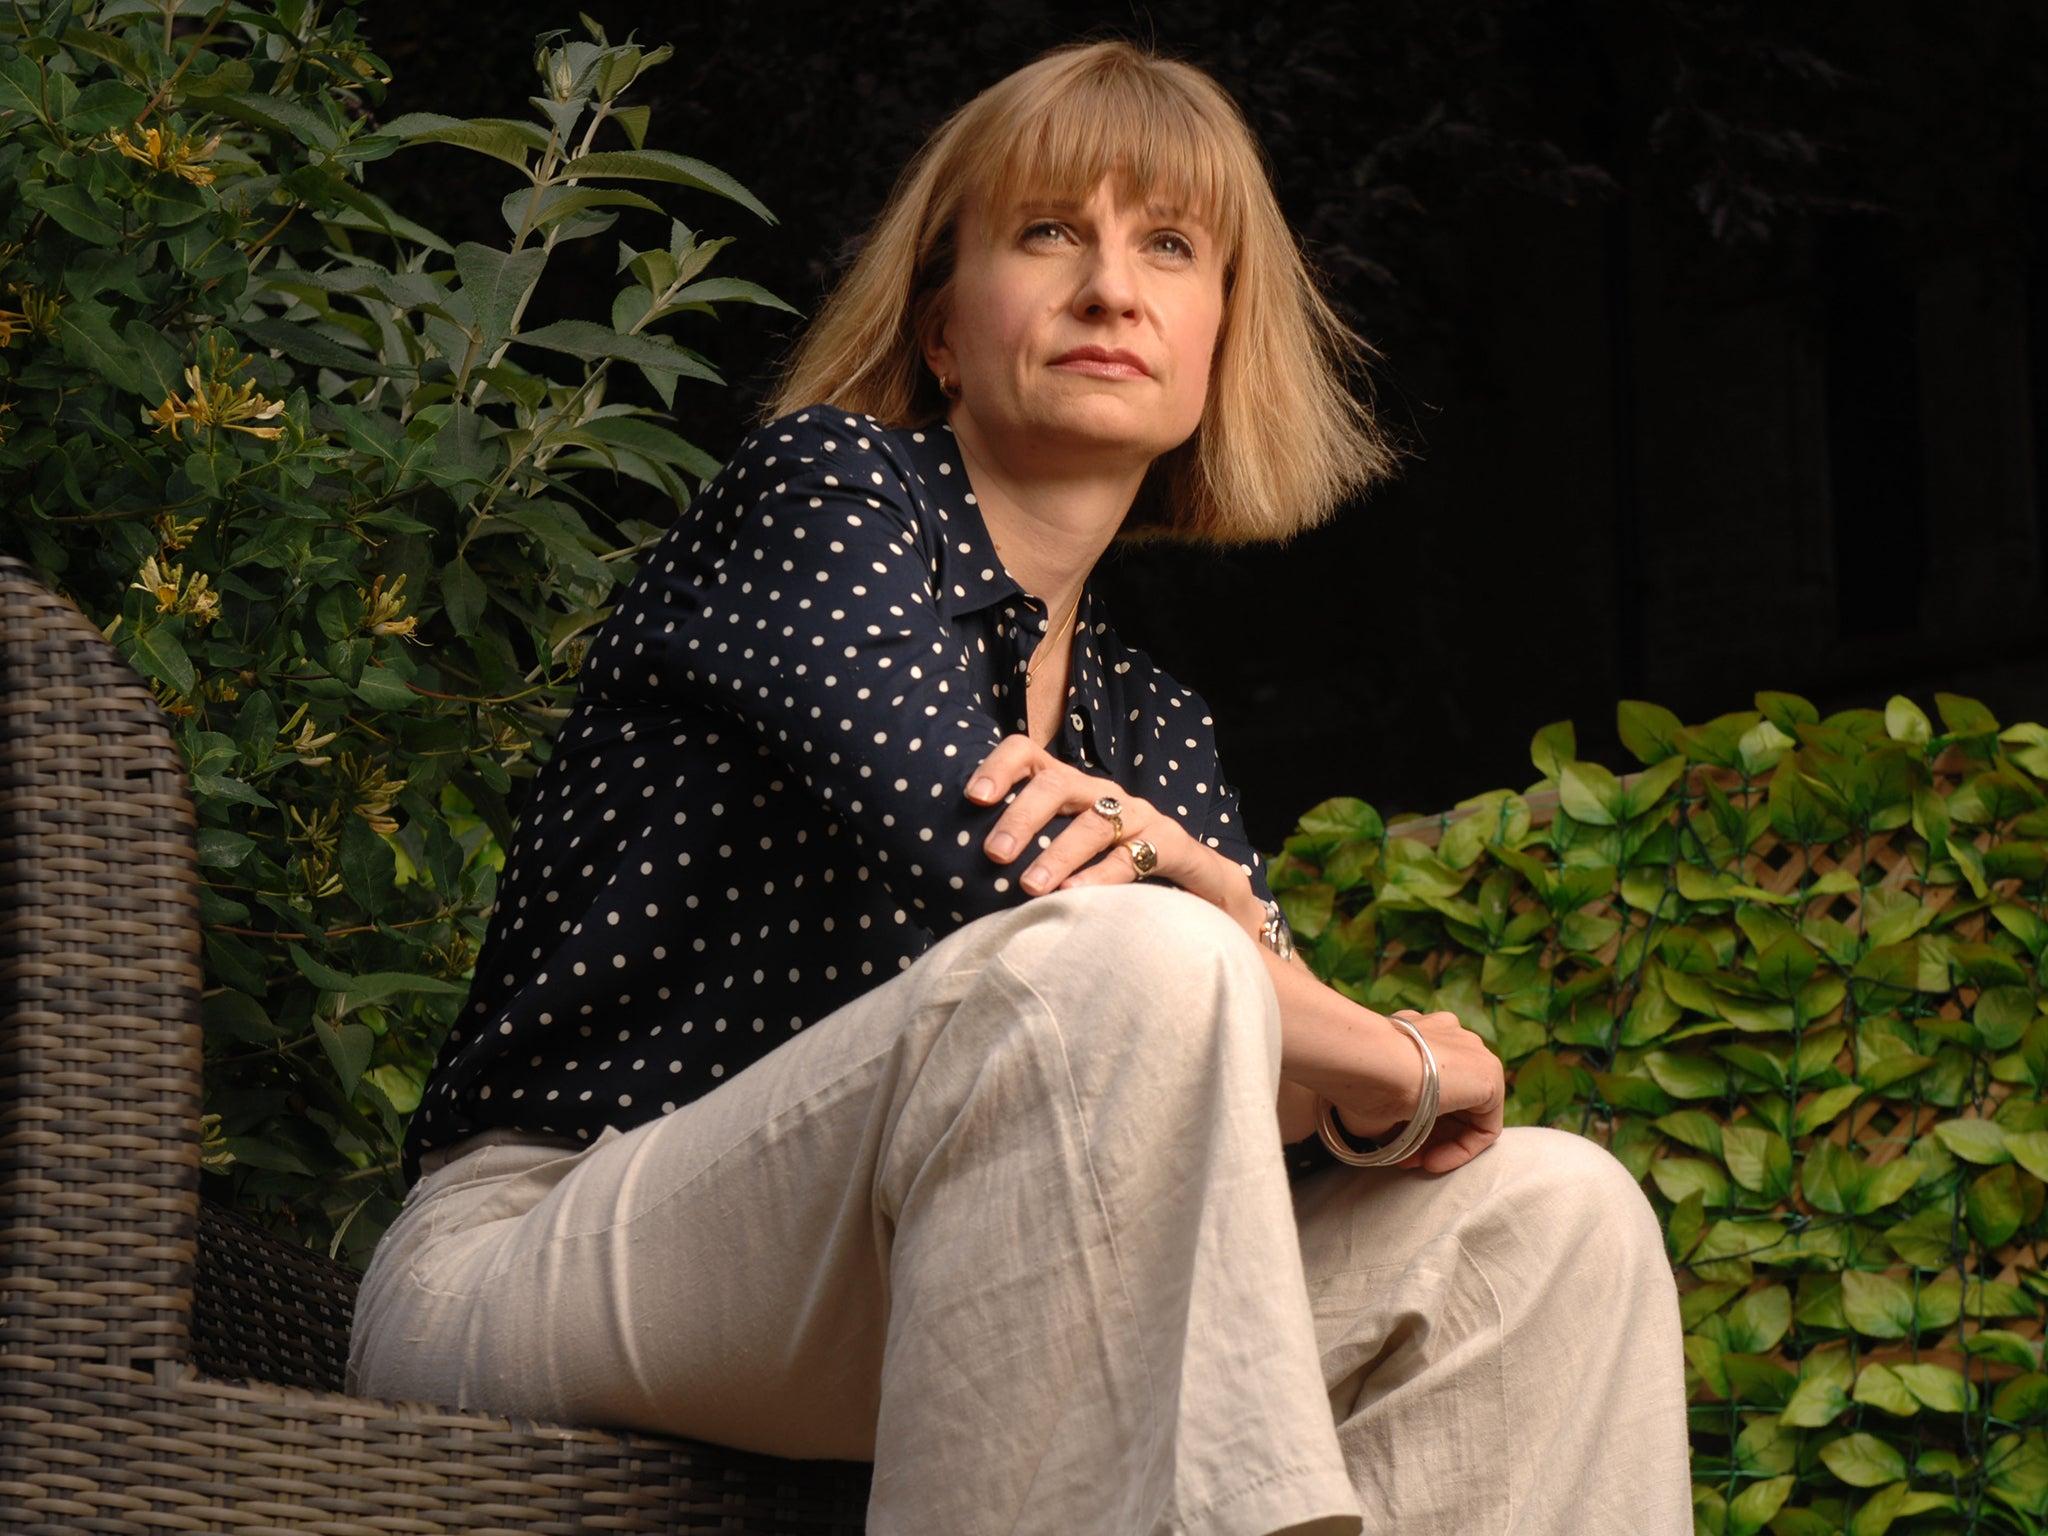 Bettina Jordan-Barber: The ex MoD strategist who went to ...